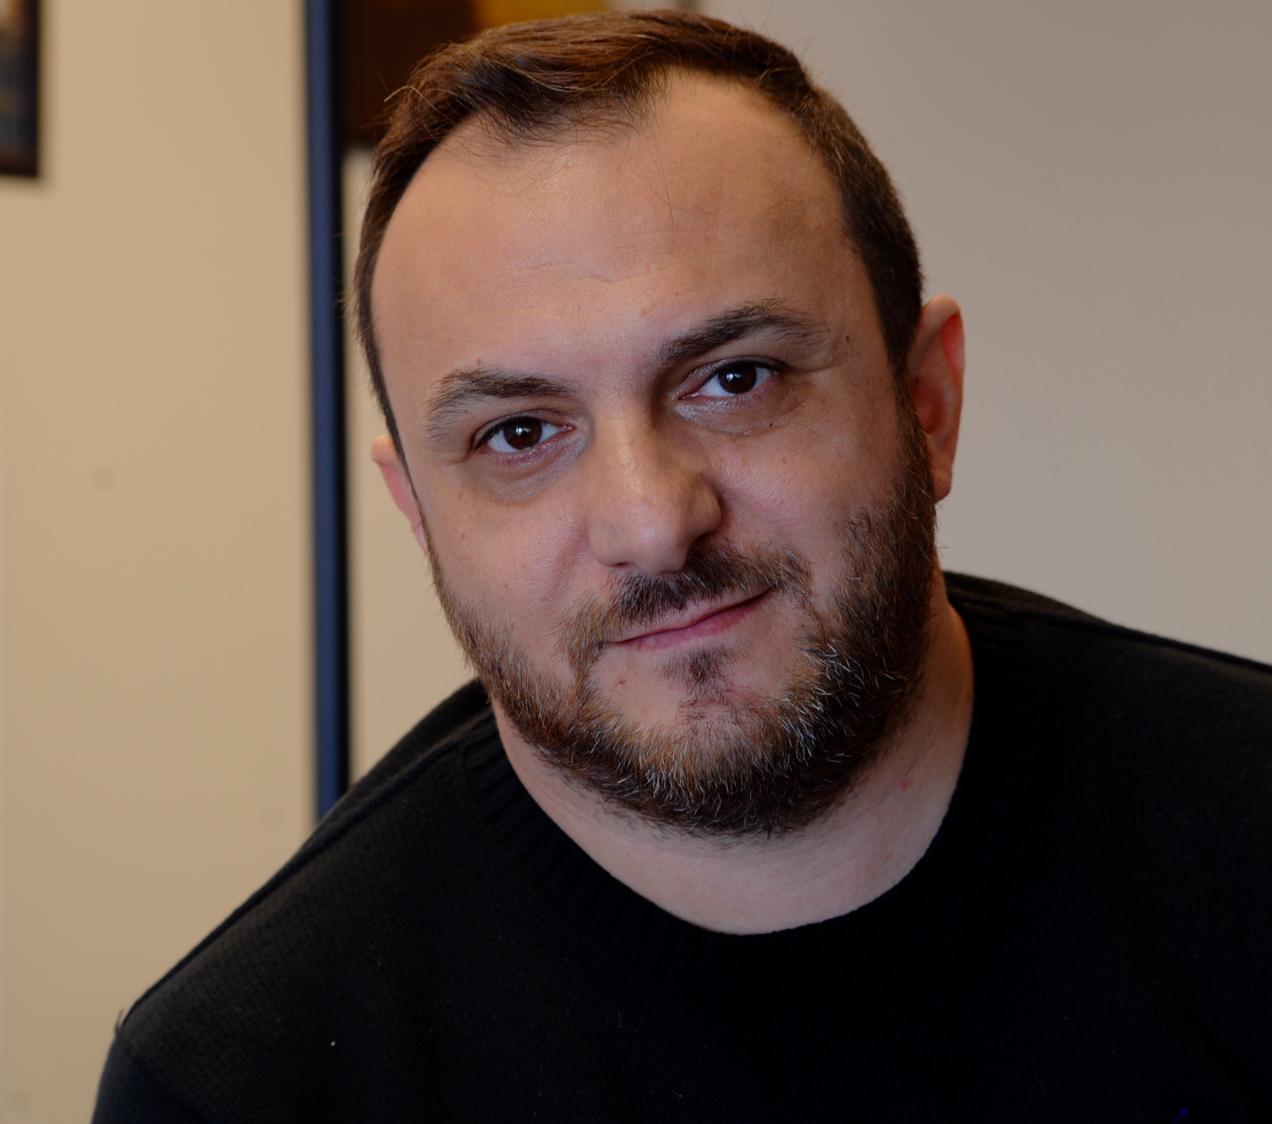 Ahmad Mroueh